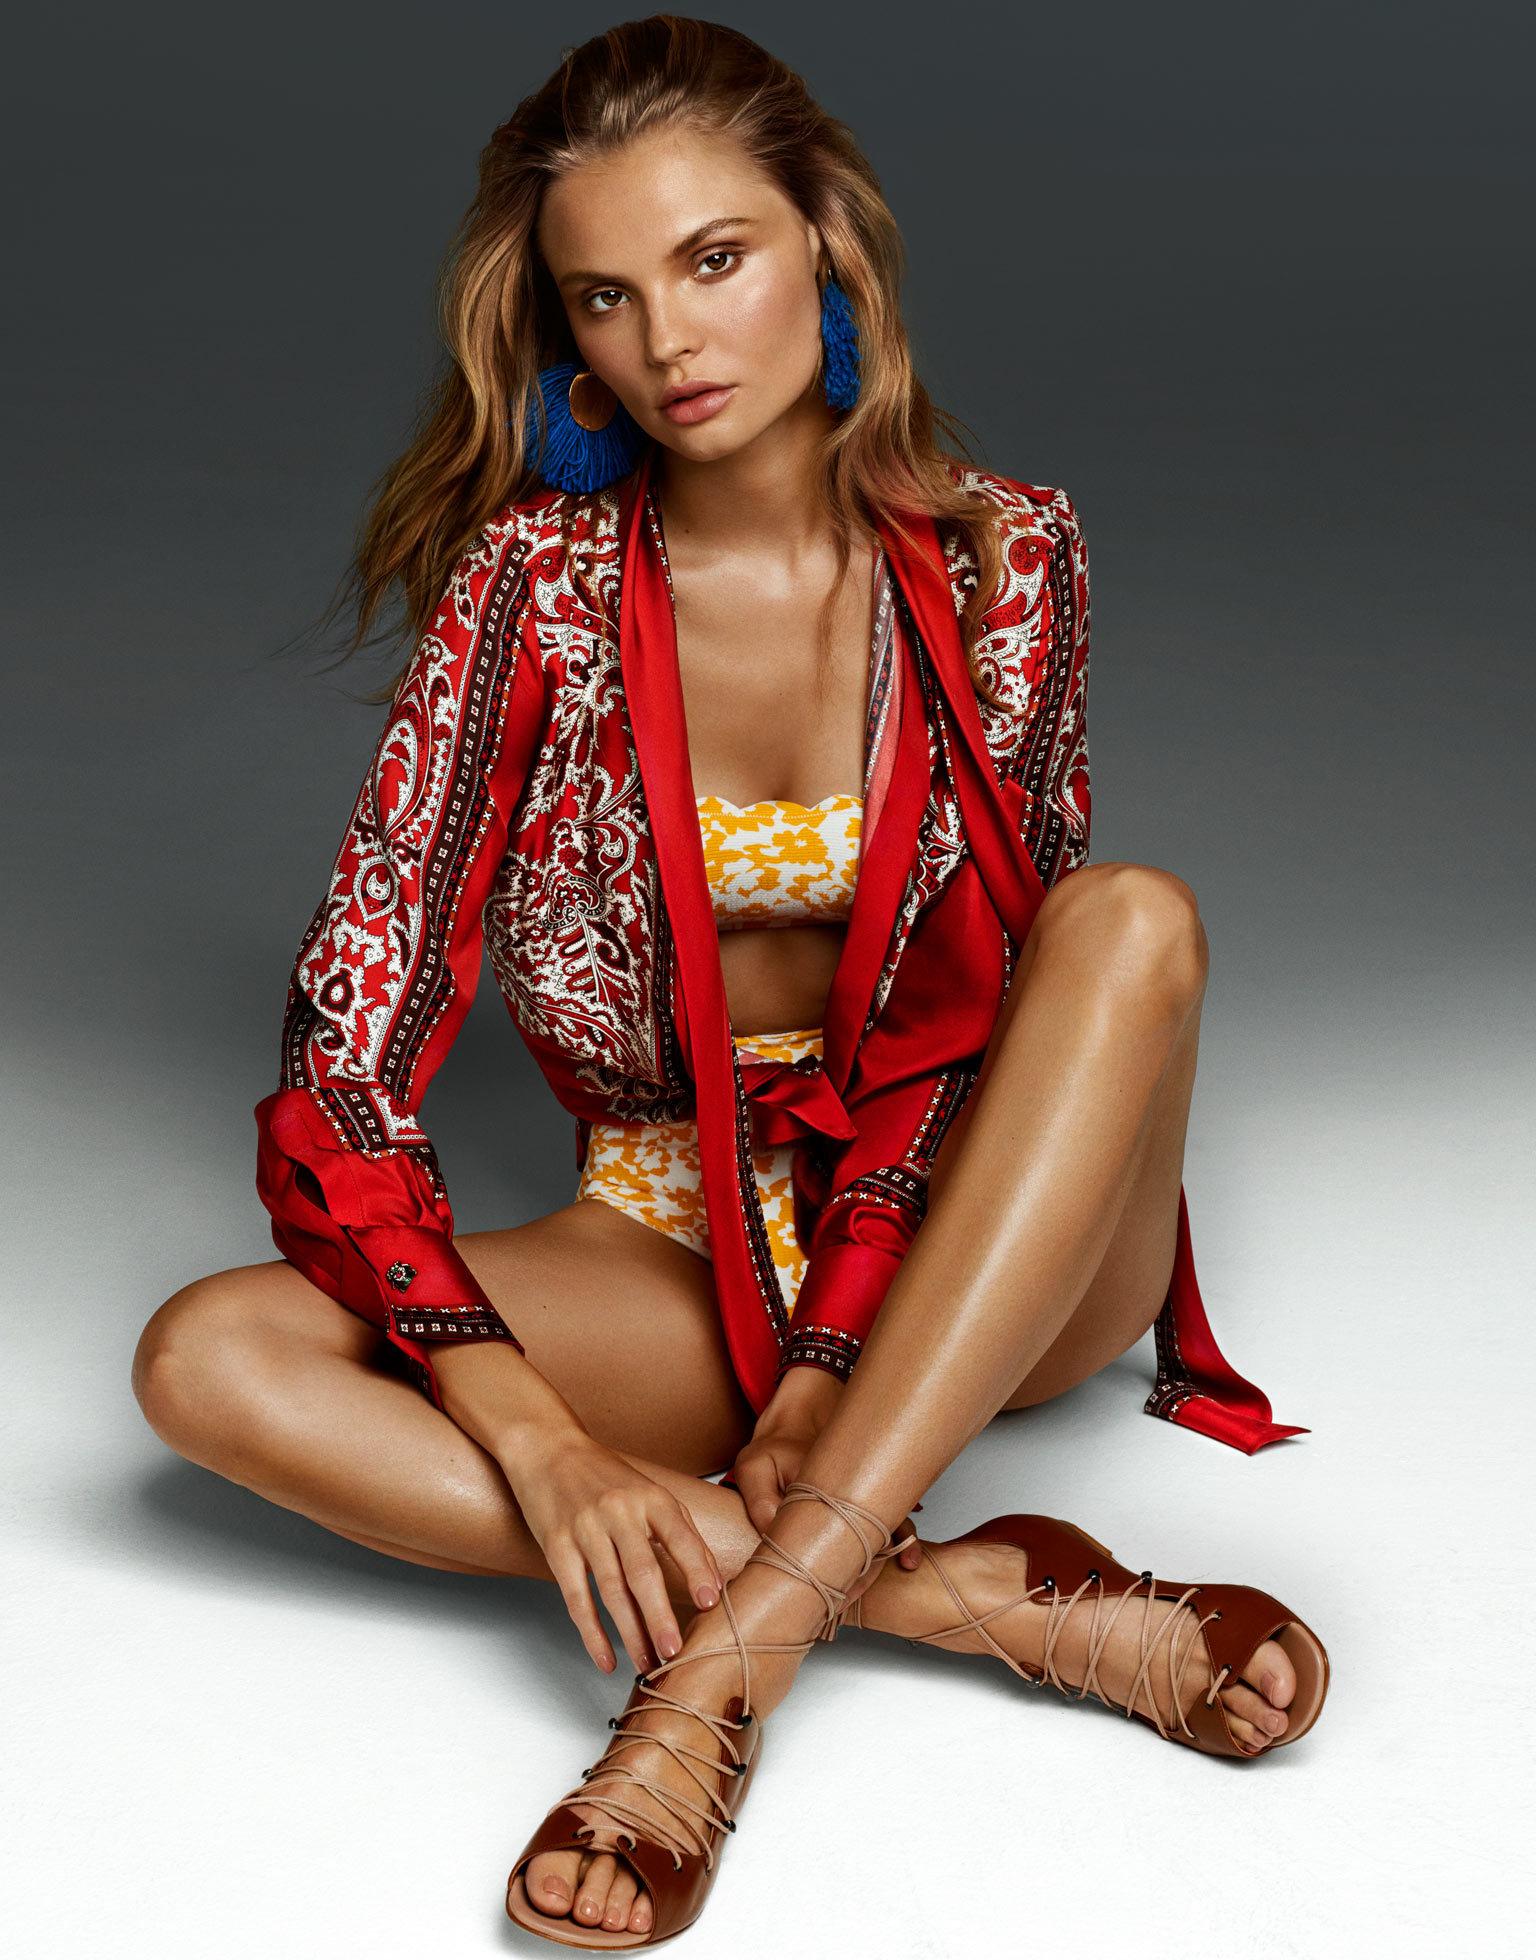 Feet Magdalena Frackowiak nude (54 photos), Topless, Hot, Twitter, legs 2017